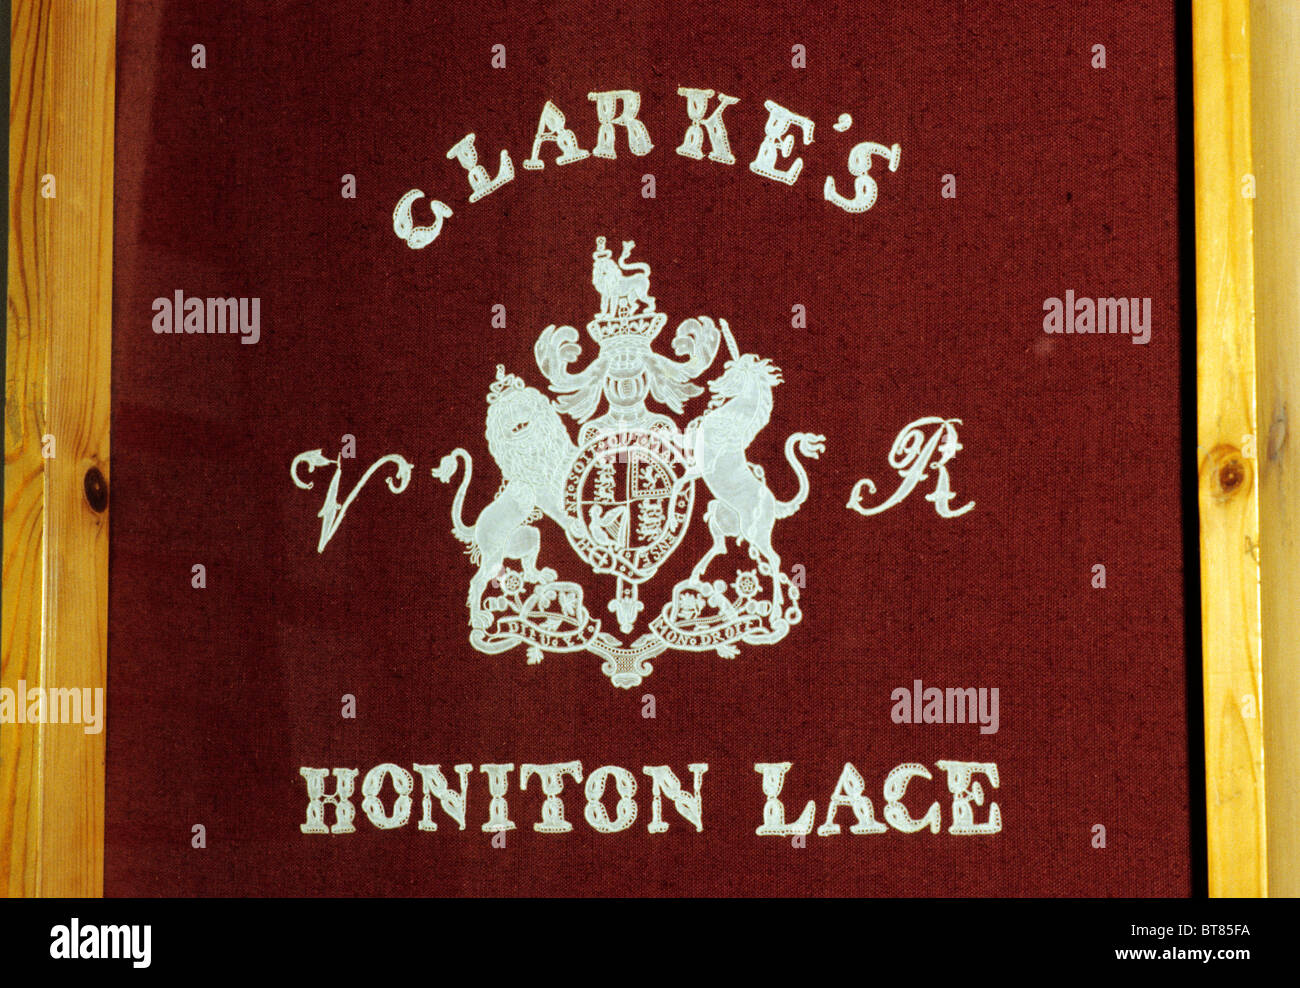 Honiton Lace Making Lace Honiton Lace Making